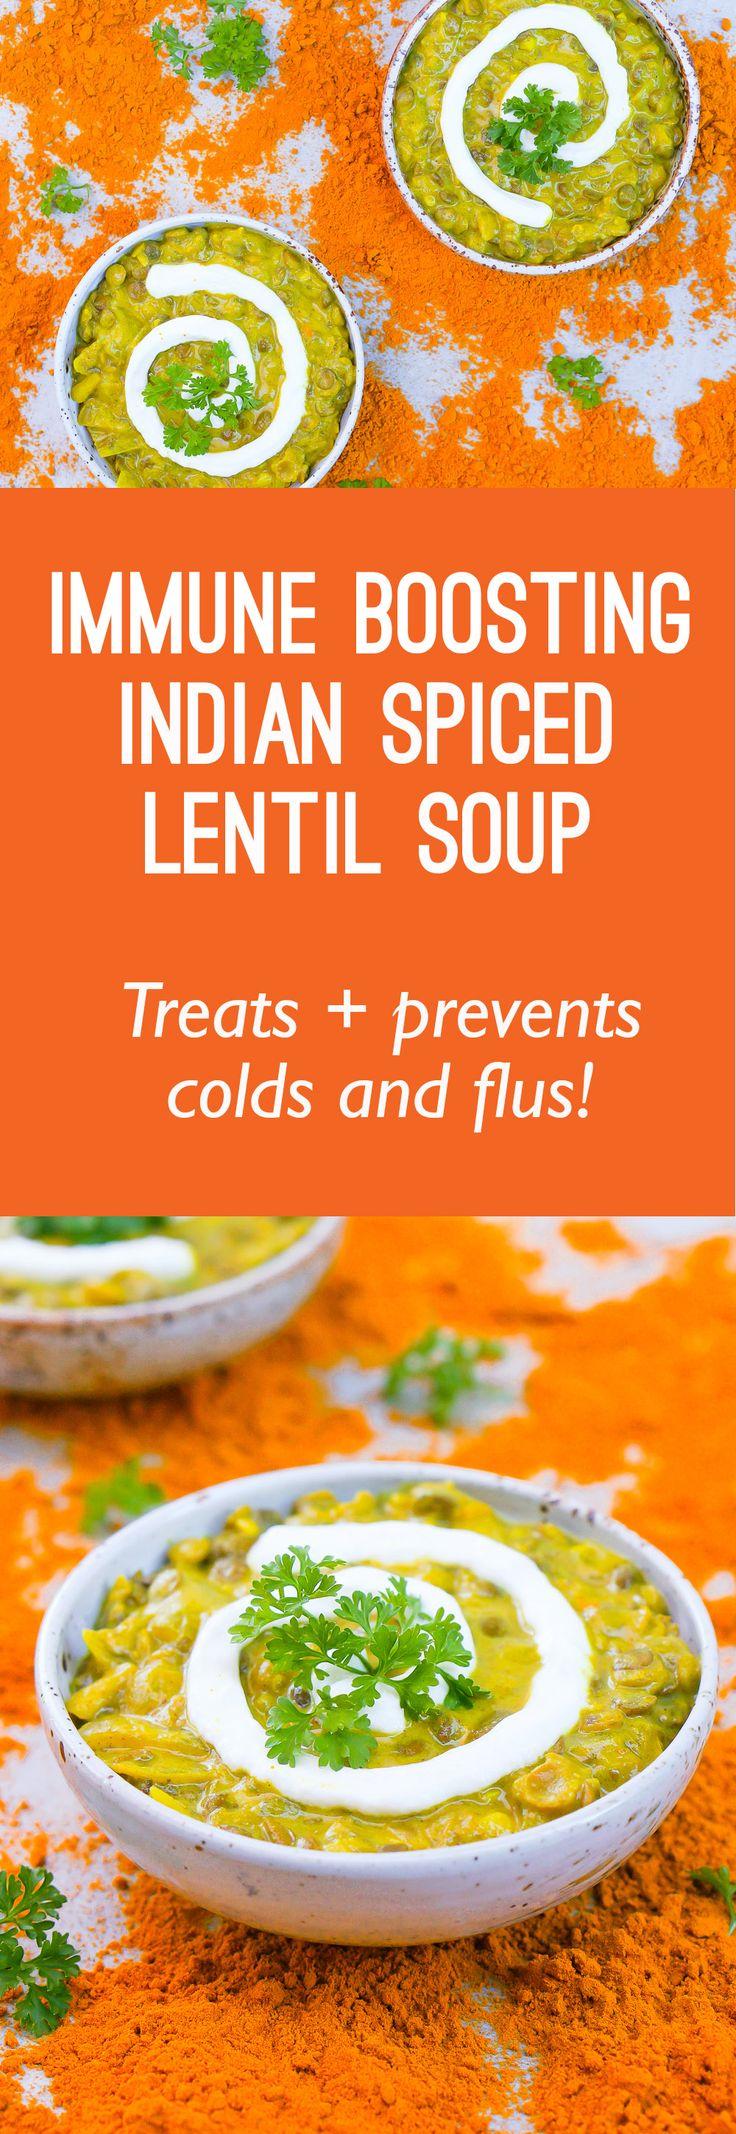 Super Easy, Super Quick Immune Boosting Lentil Soup Recipe (Vegan, Gluten Free)